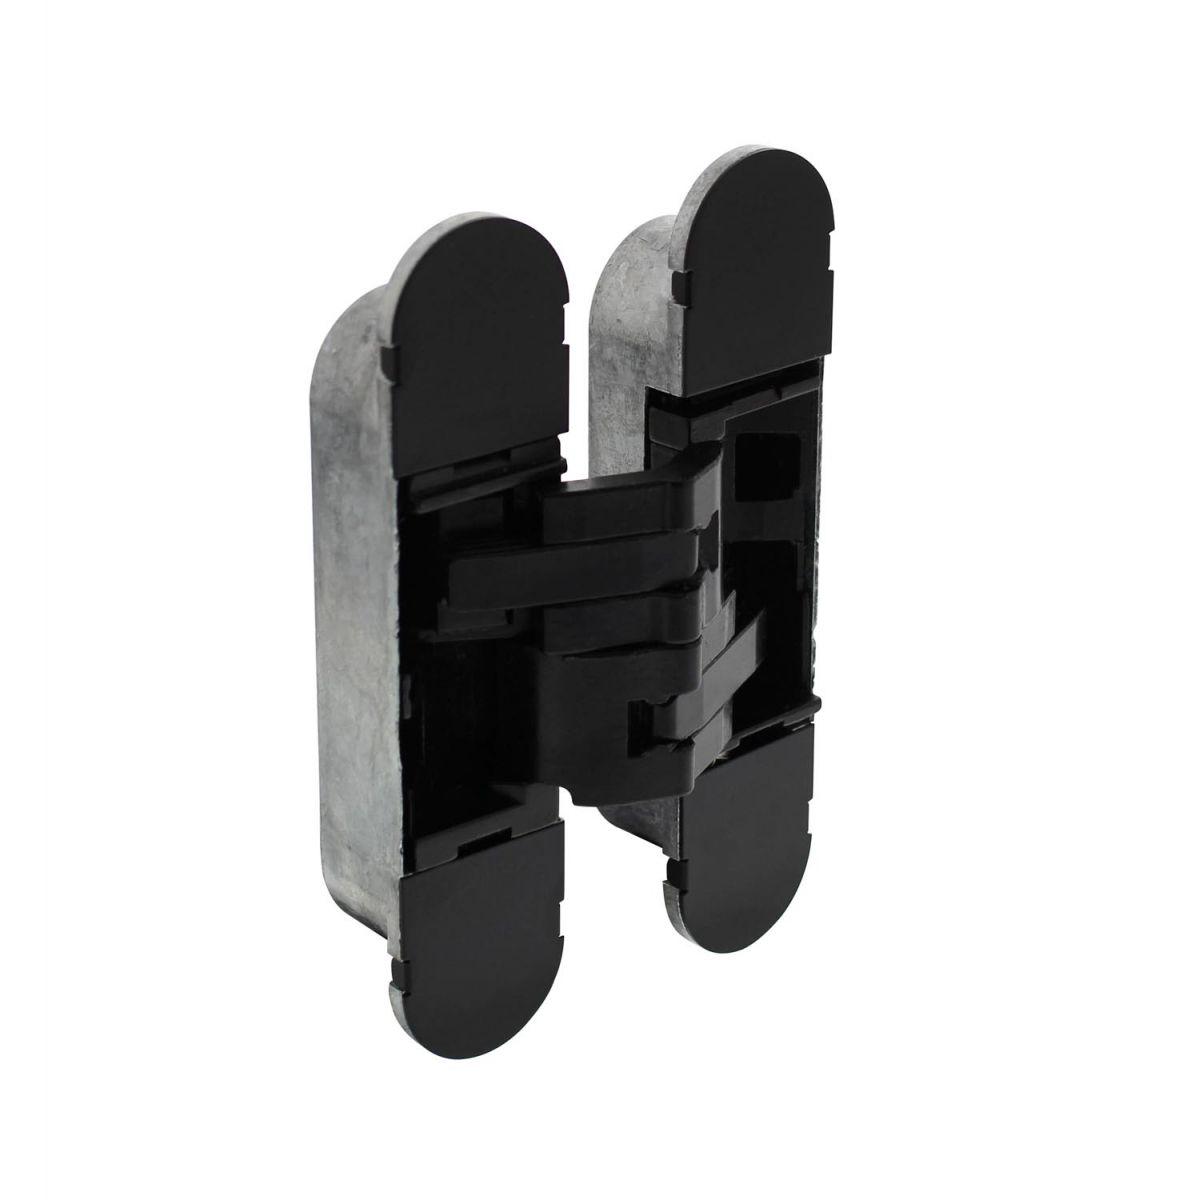 invisible 3d hinge zamak black